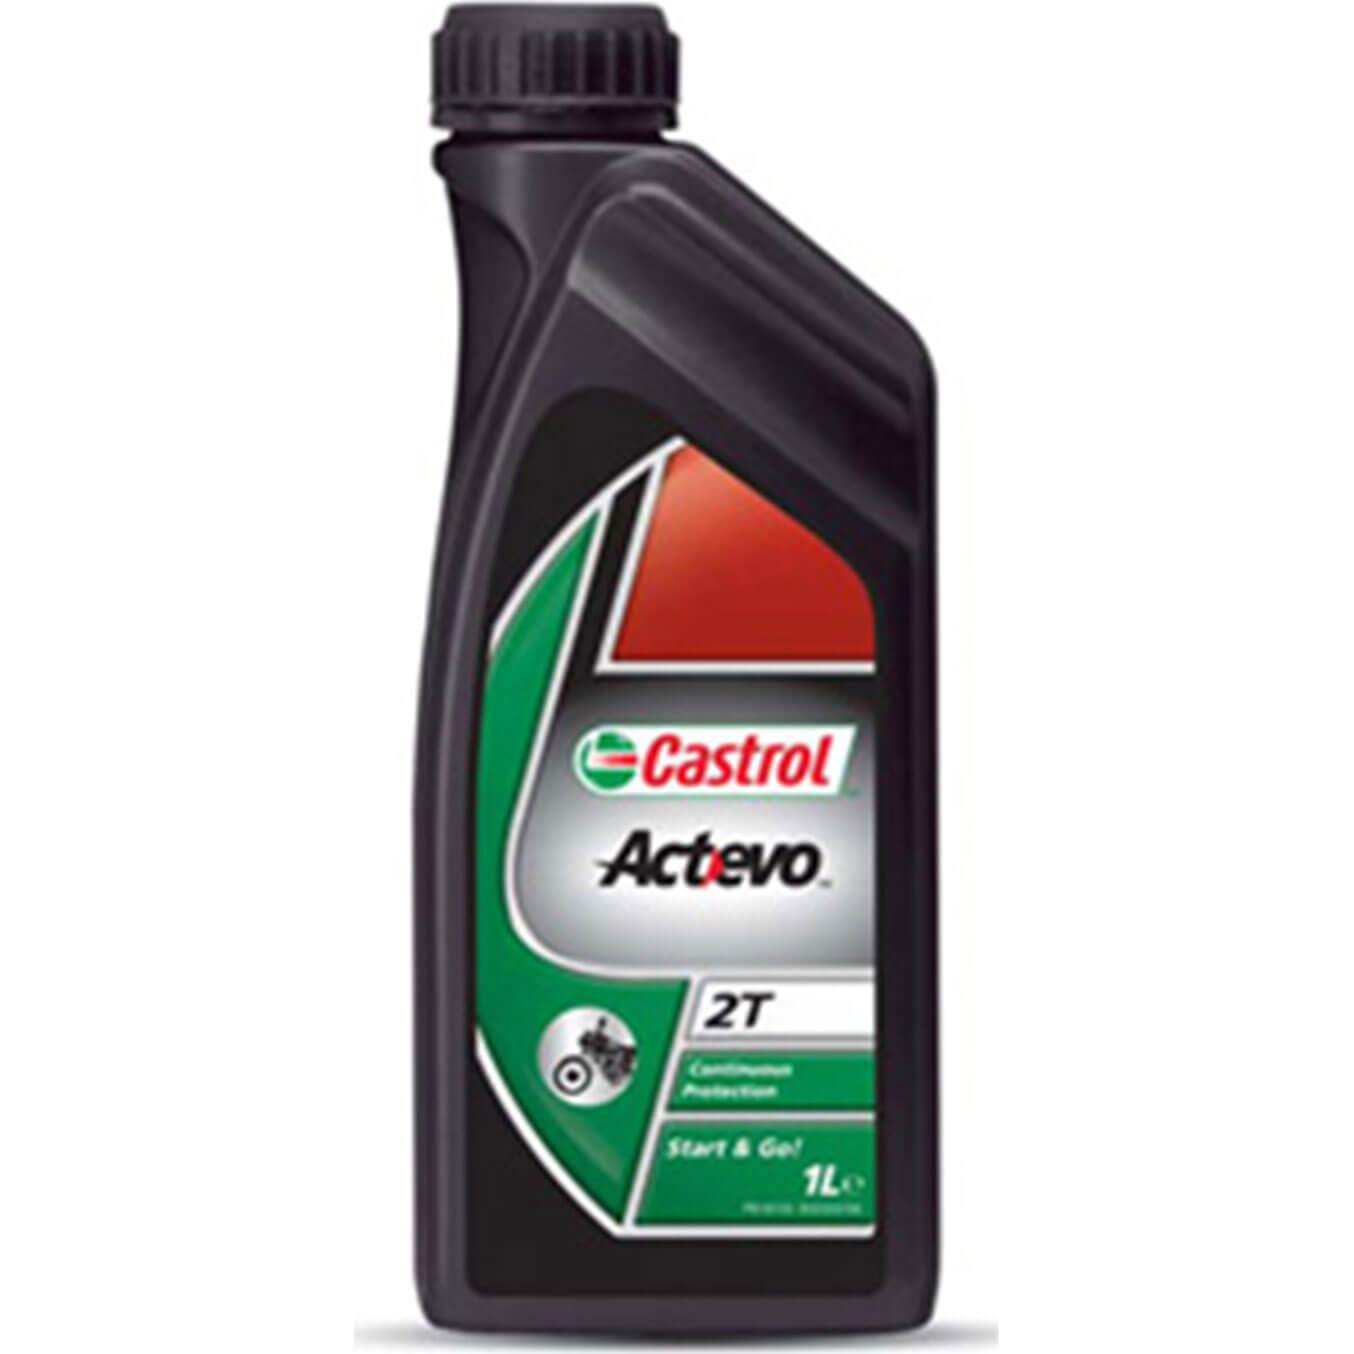 Castrol 2 Stroke Oil Act Evo 2 1L